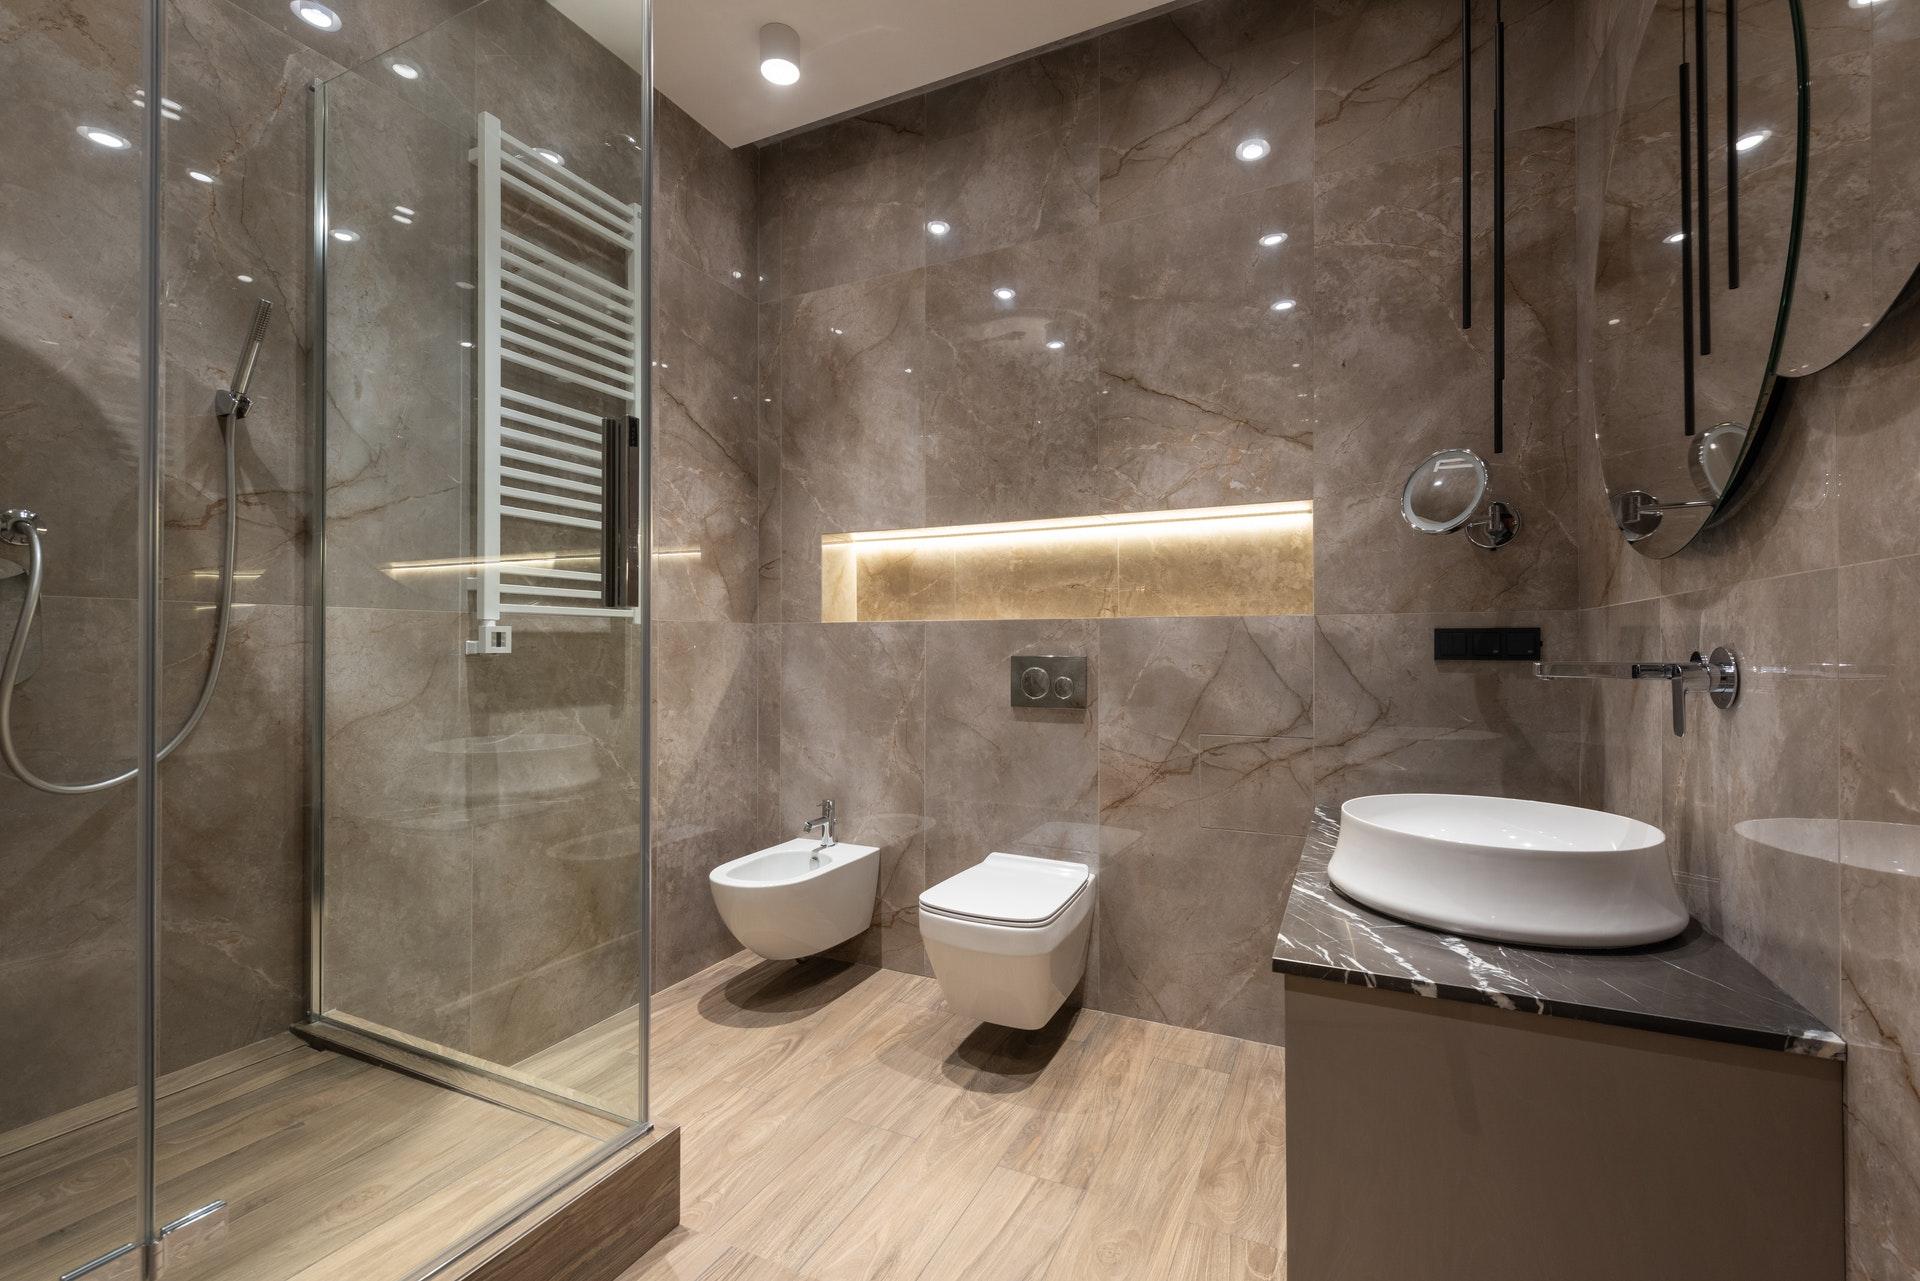 Planning The Bathroom Remodel